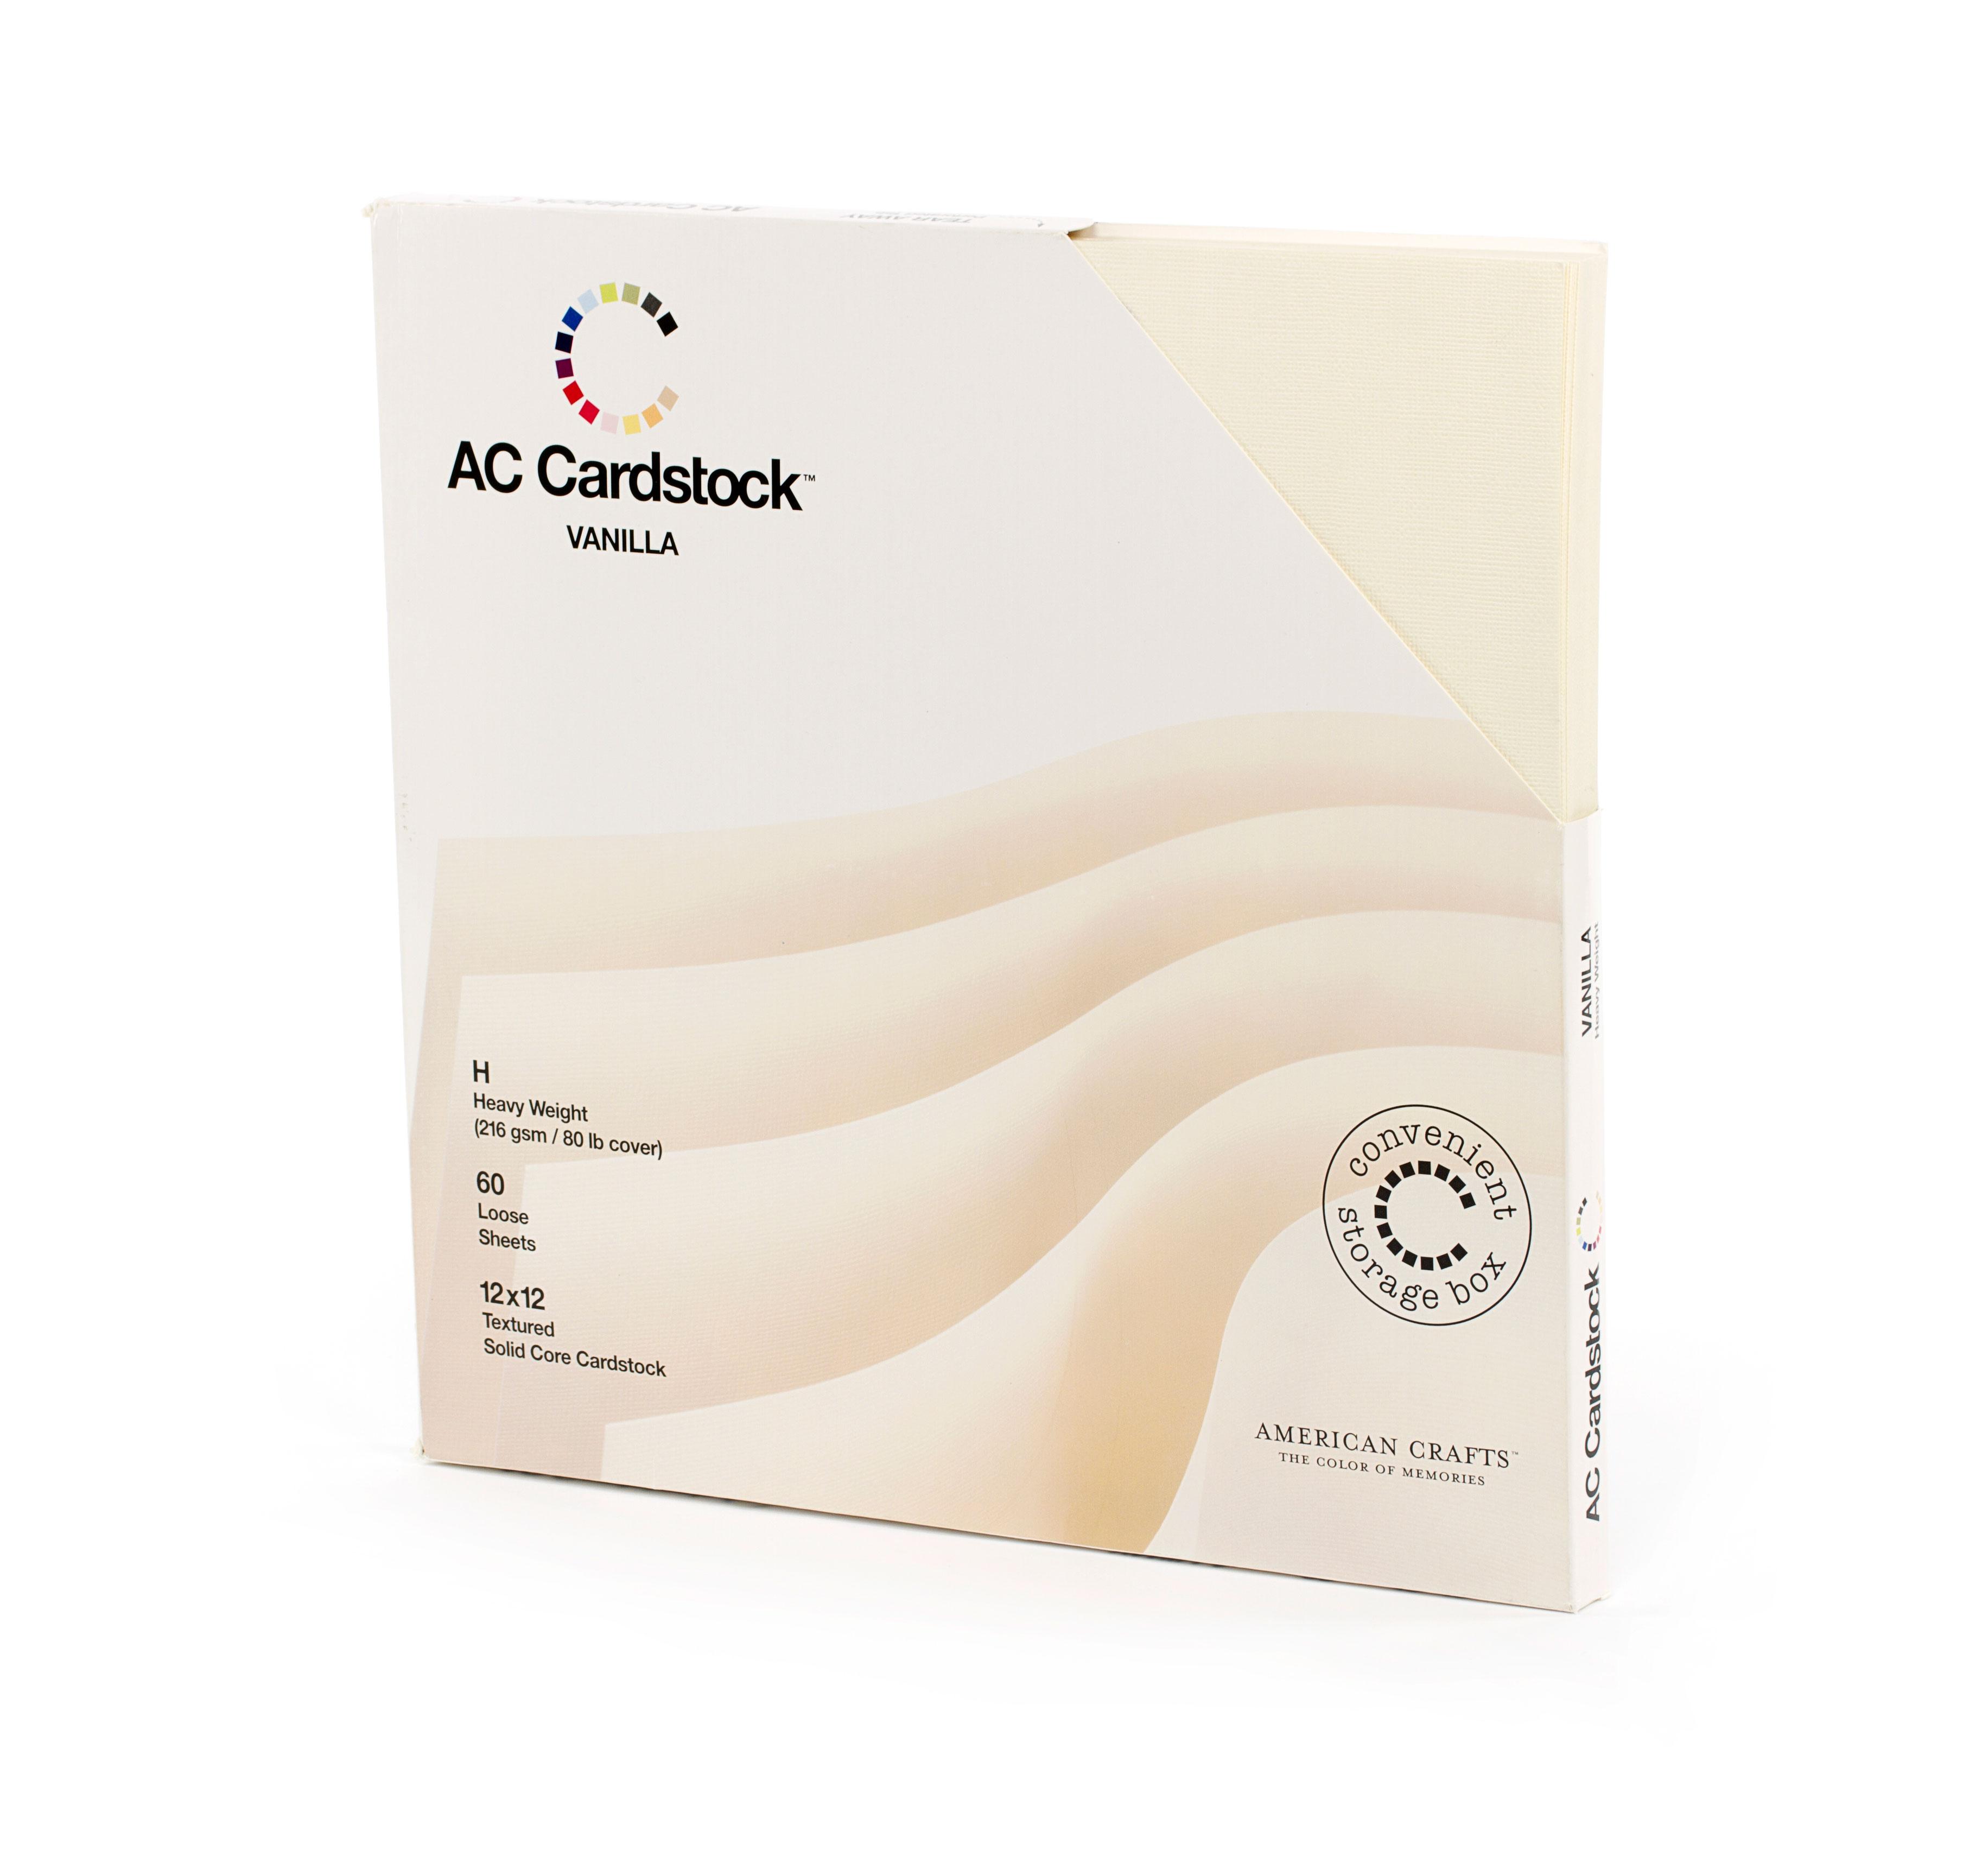 "American Craft - Cardstock pack 12x12"" x 60"